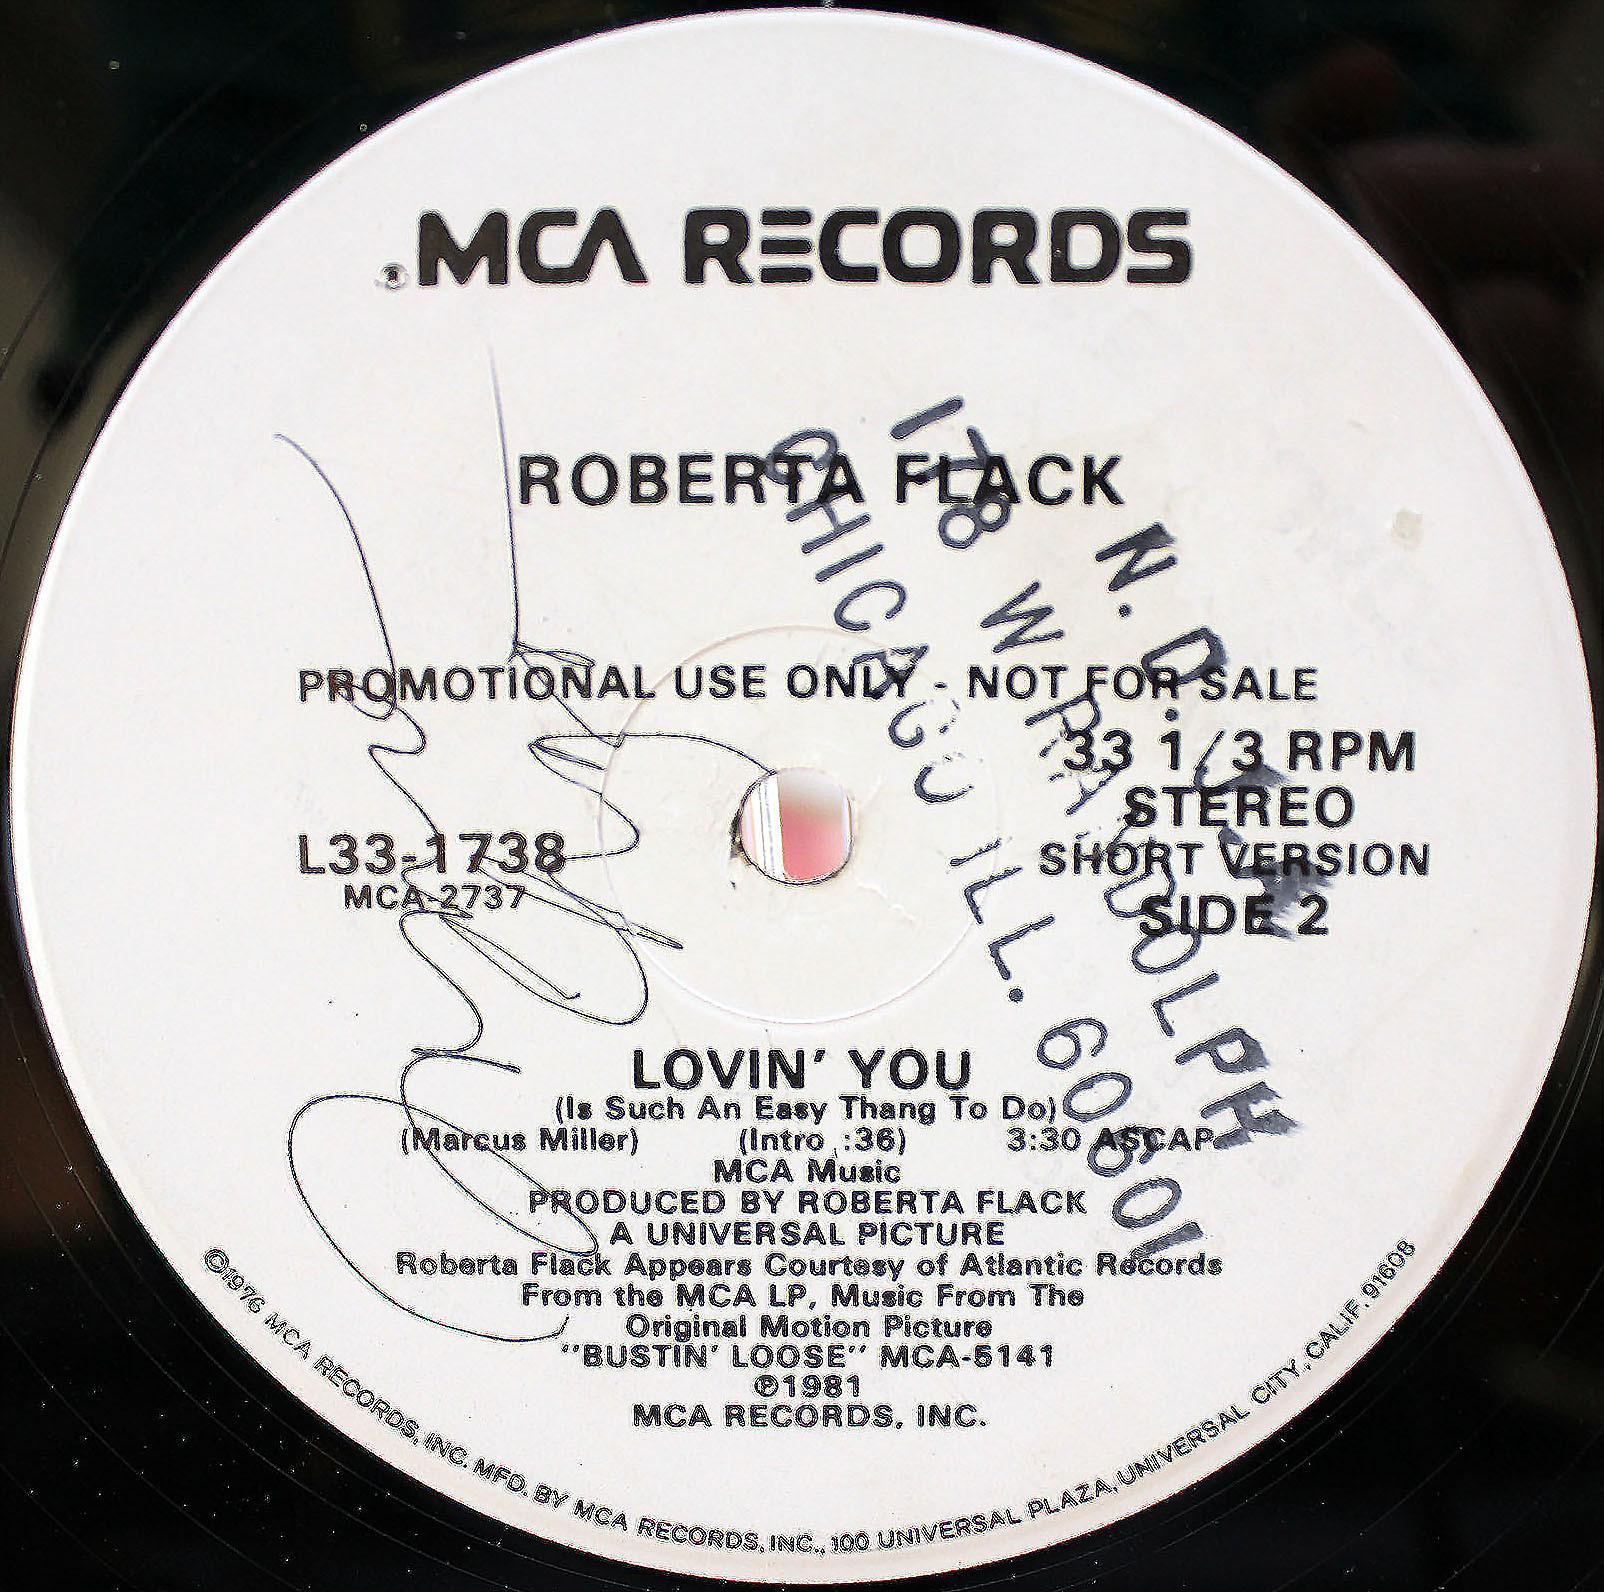 Roberta Flack loving you 04